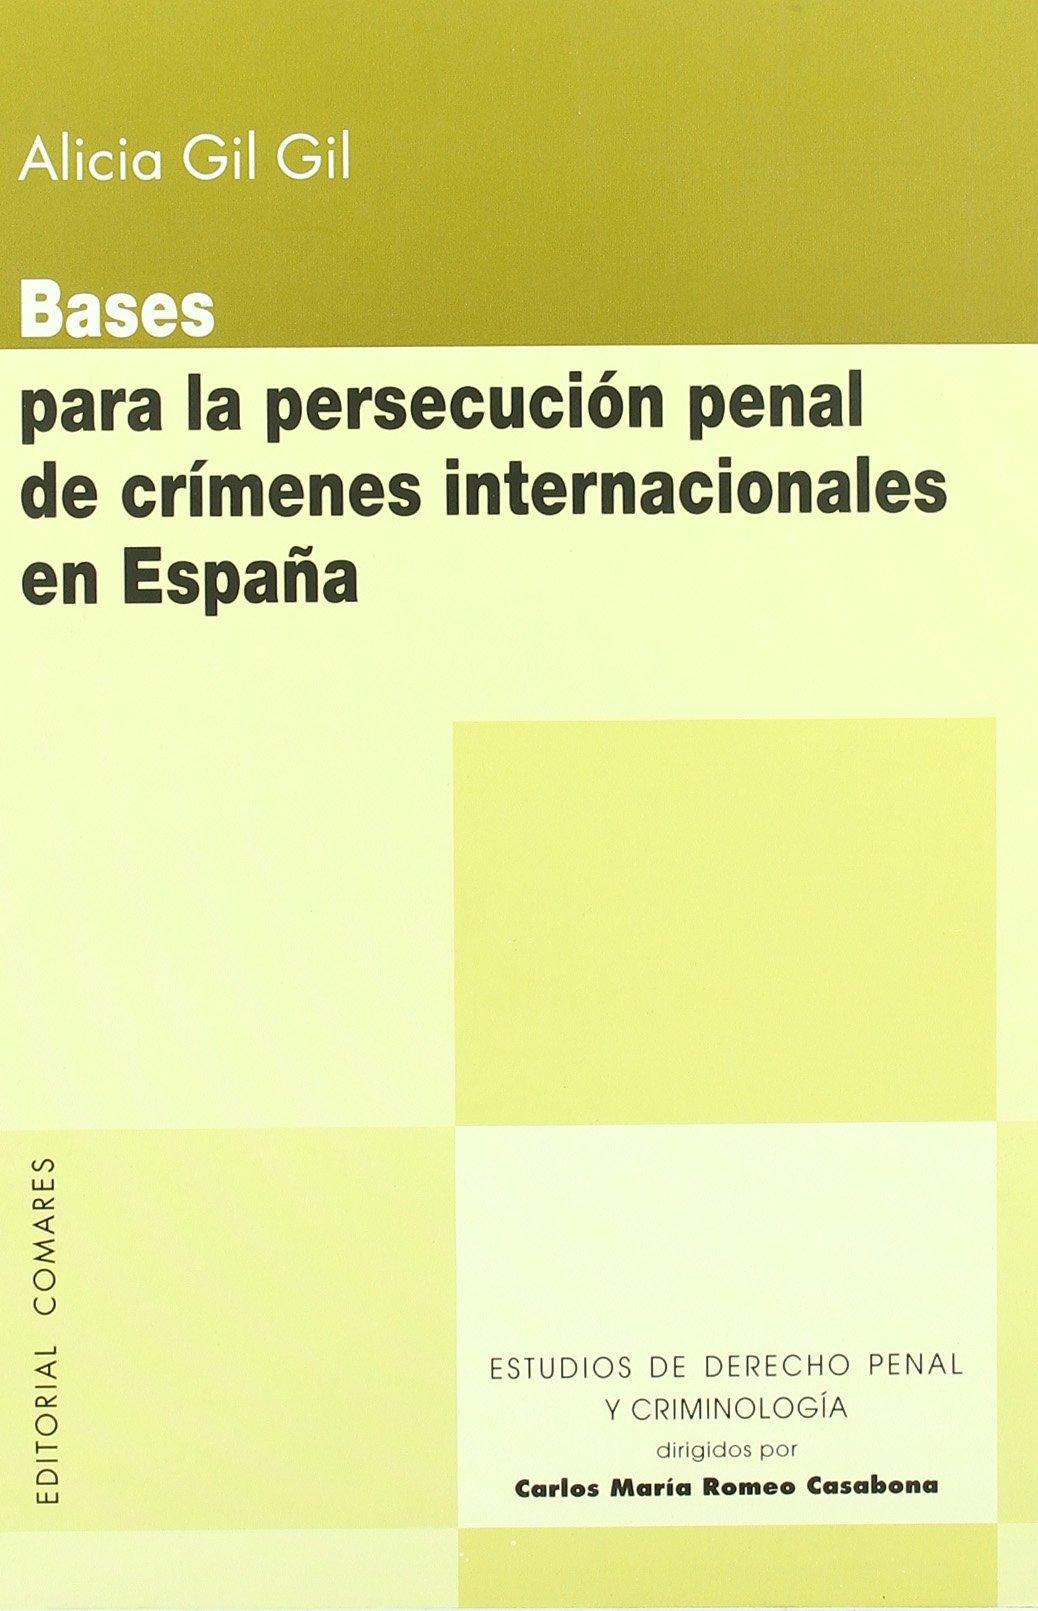 BASES PARA PERSECUCION PENAL CRIMENES INTERNACIONALES ESPAÑA: Amazon.es: GIL GIL,ALICIA: Libros